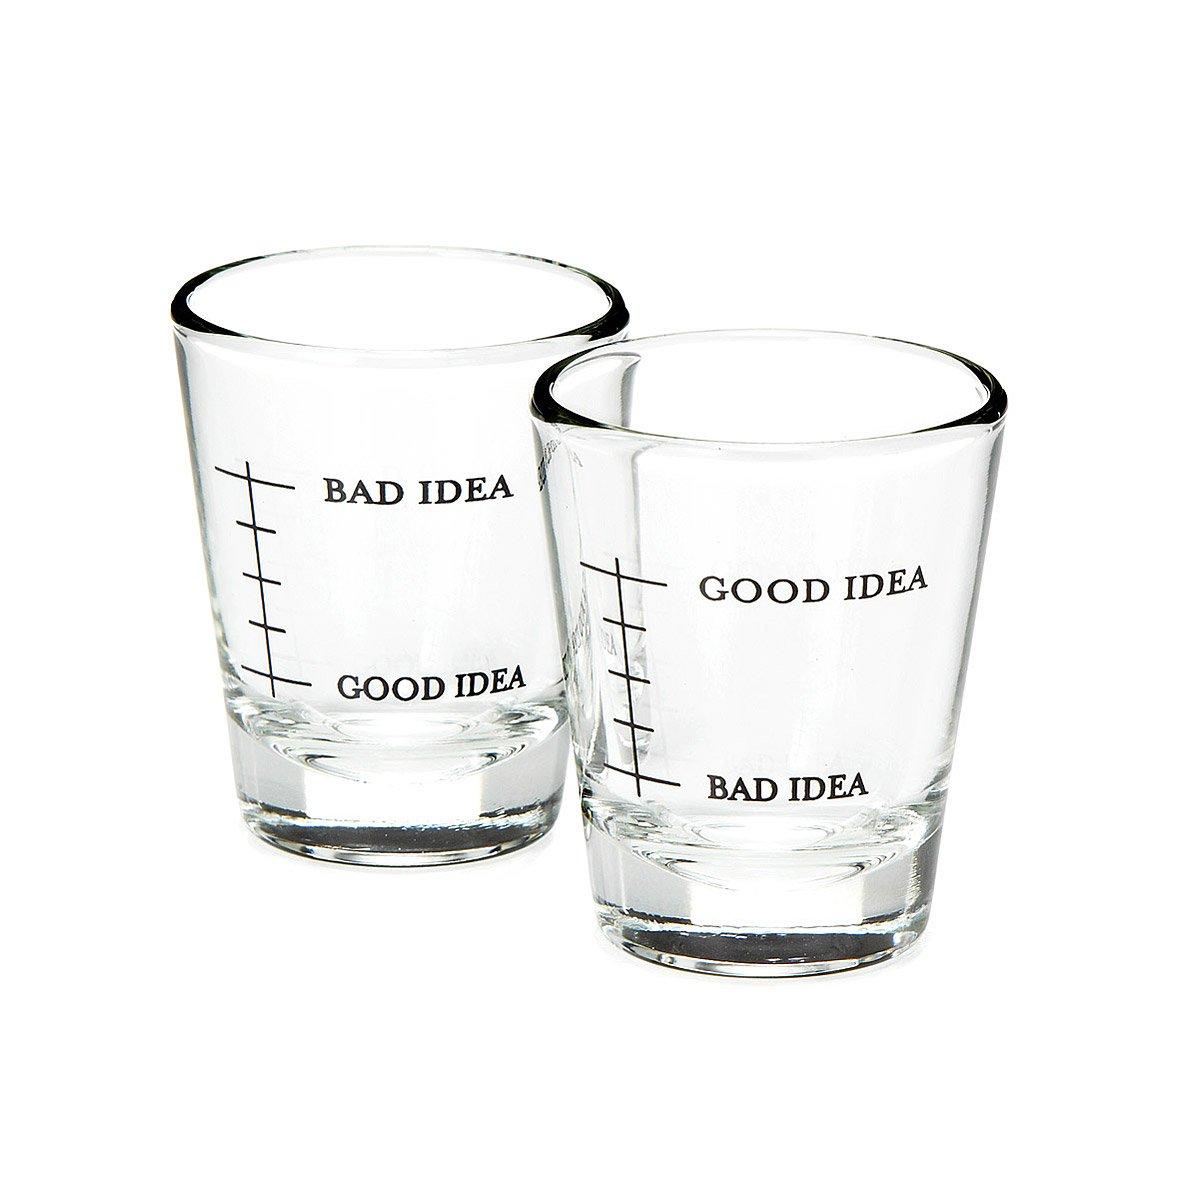 bad idea good idea shot glasses set of 2